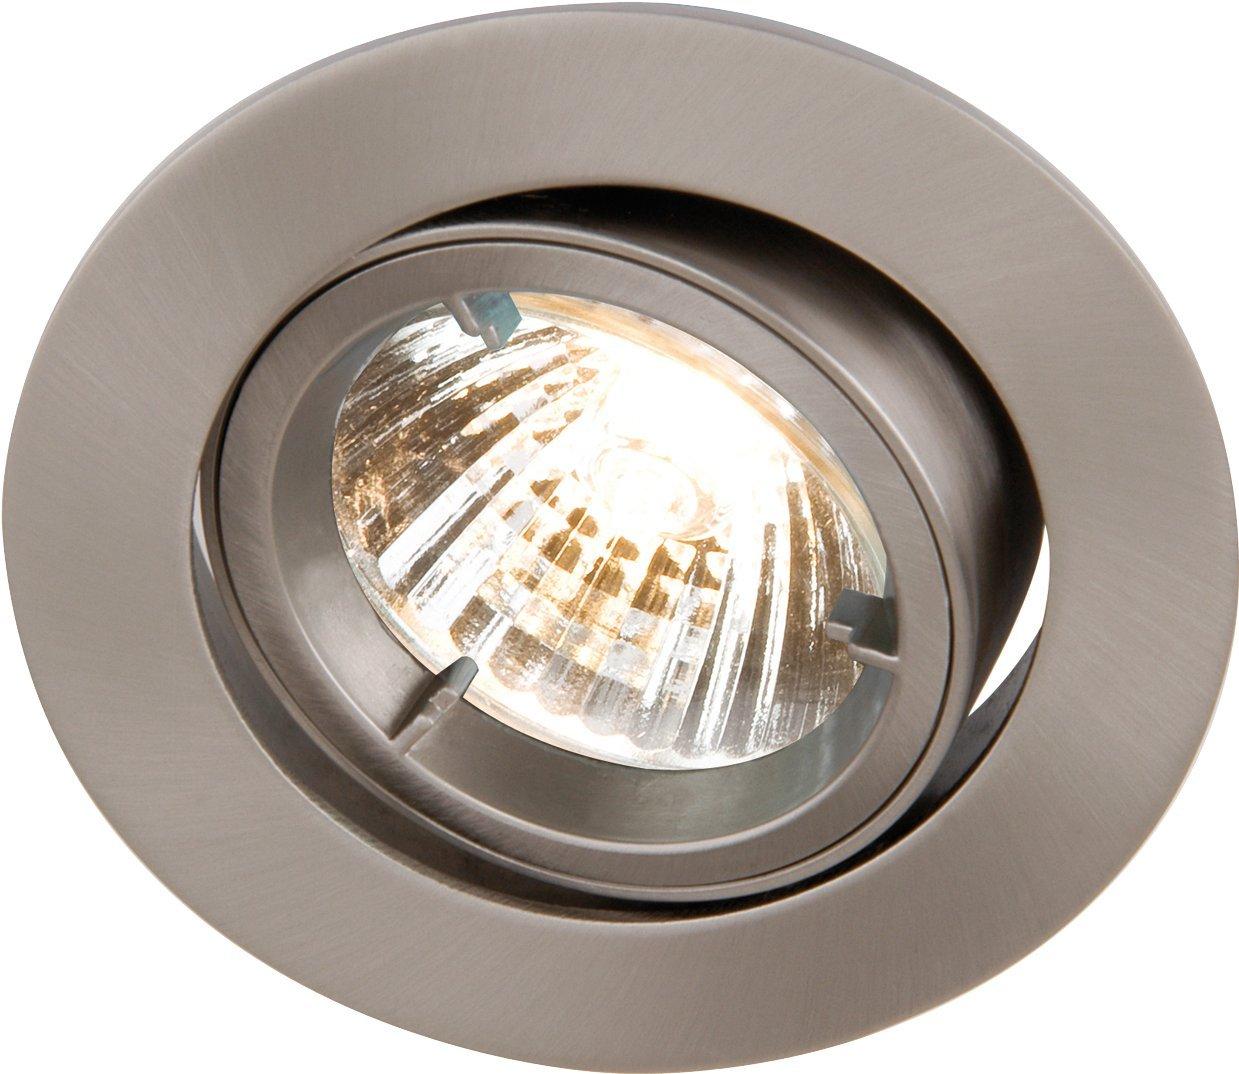 IP65 Recessed Bathroom Shower Downlight GU10//MR16 Light Fitting in Chrome-RDSHC